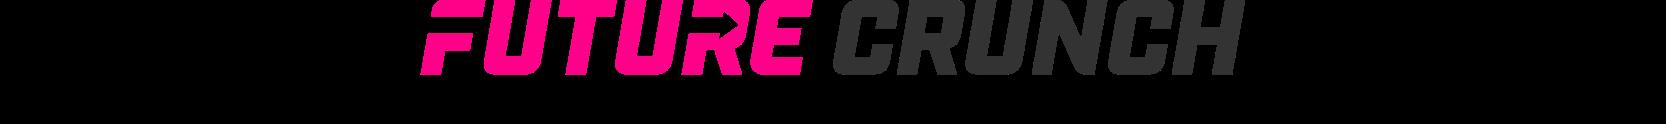 Future Crunch logo\